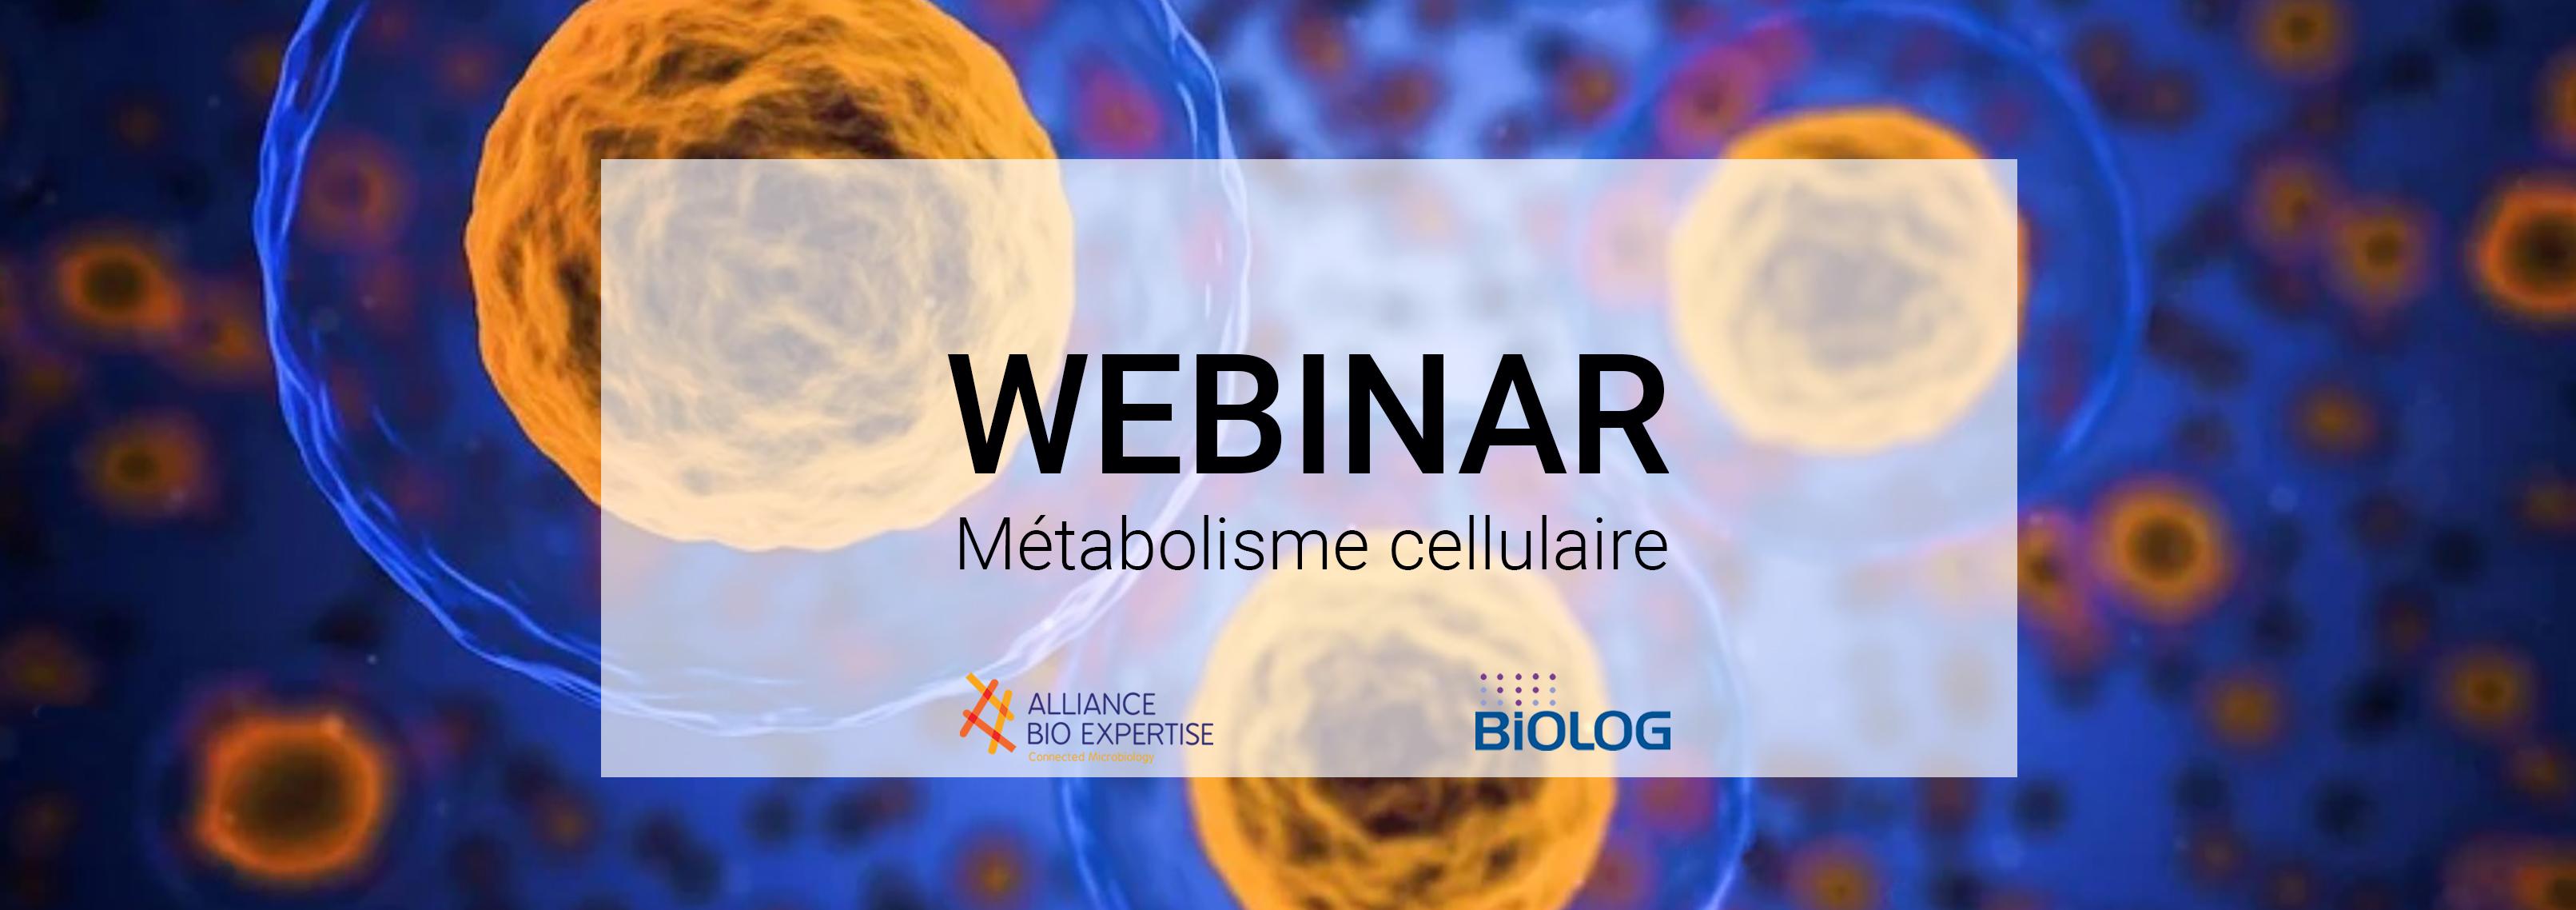 webinar métabolisme cellulaire - alliance bio expertise